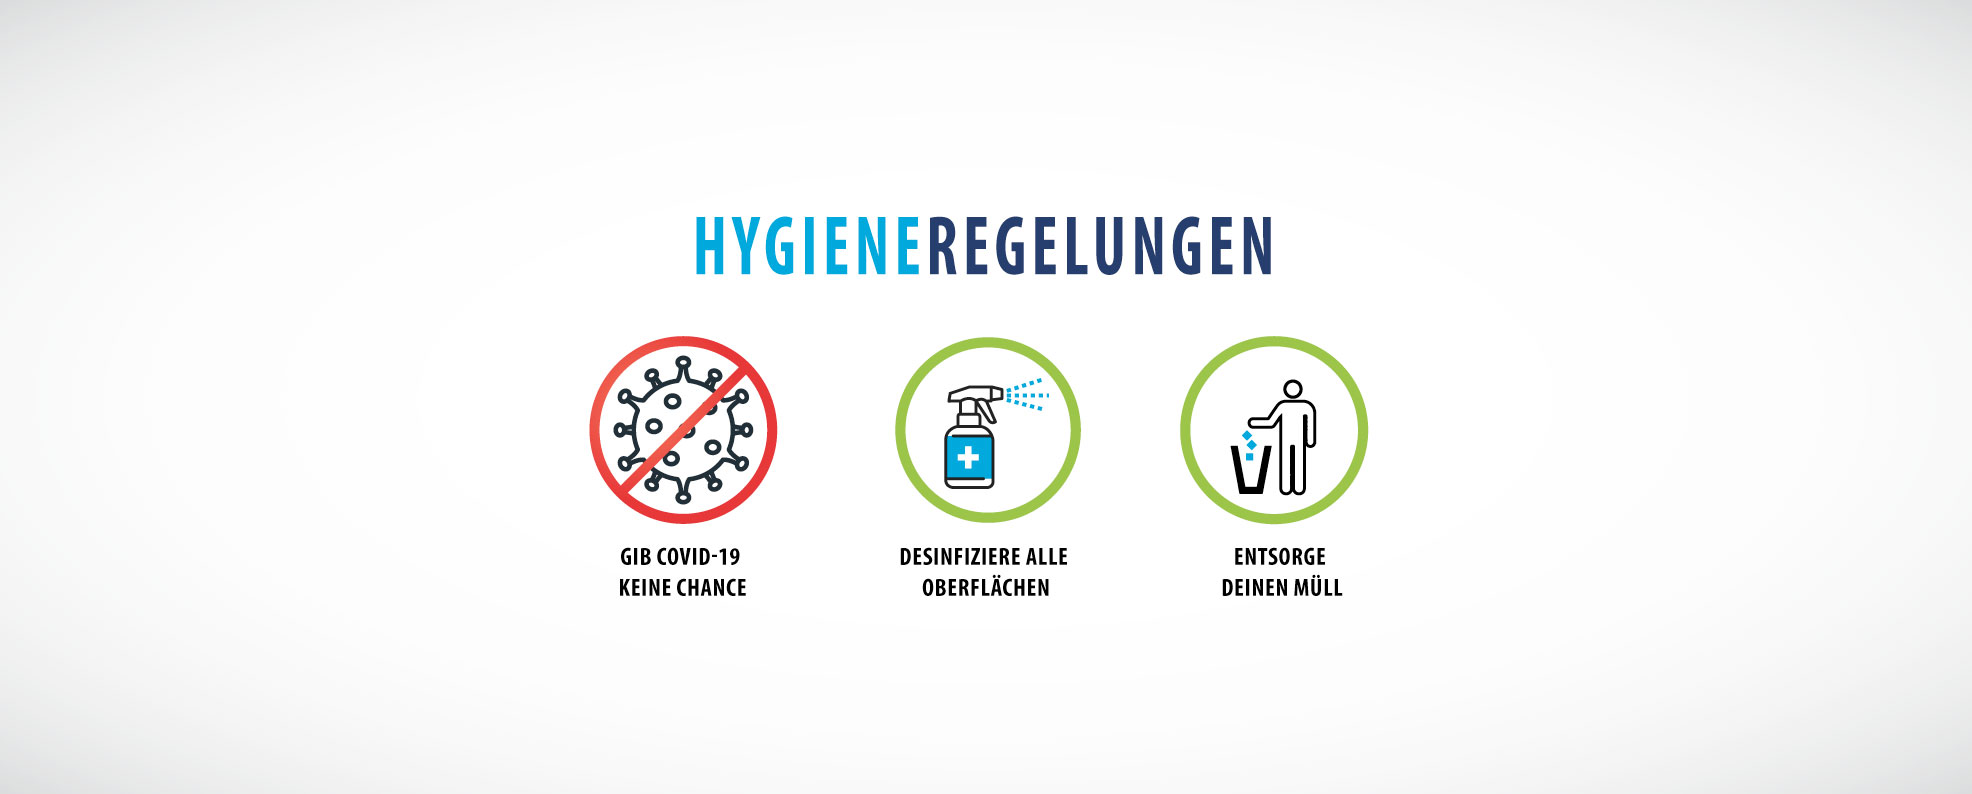 Hygieneregelungen